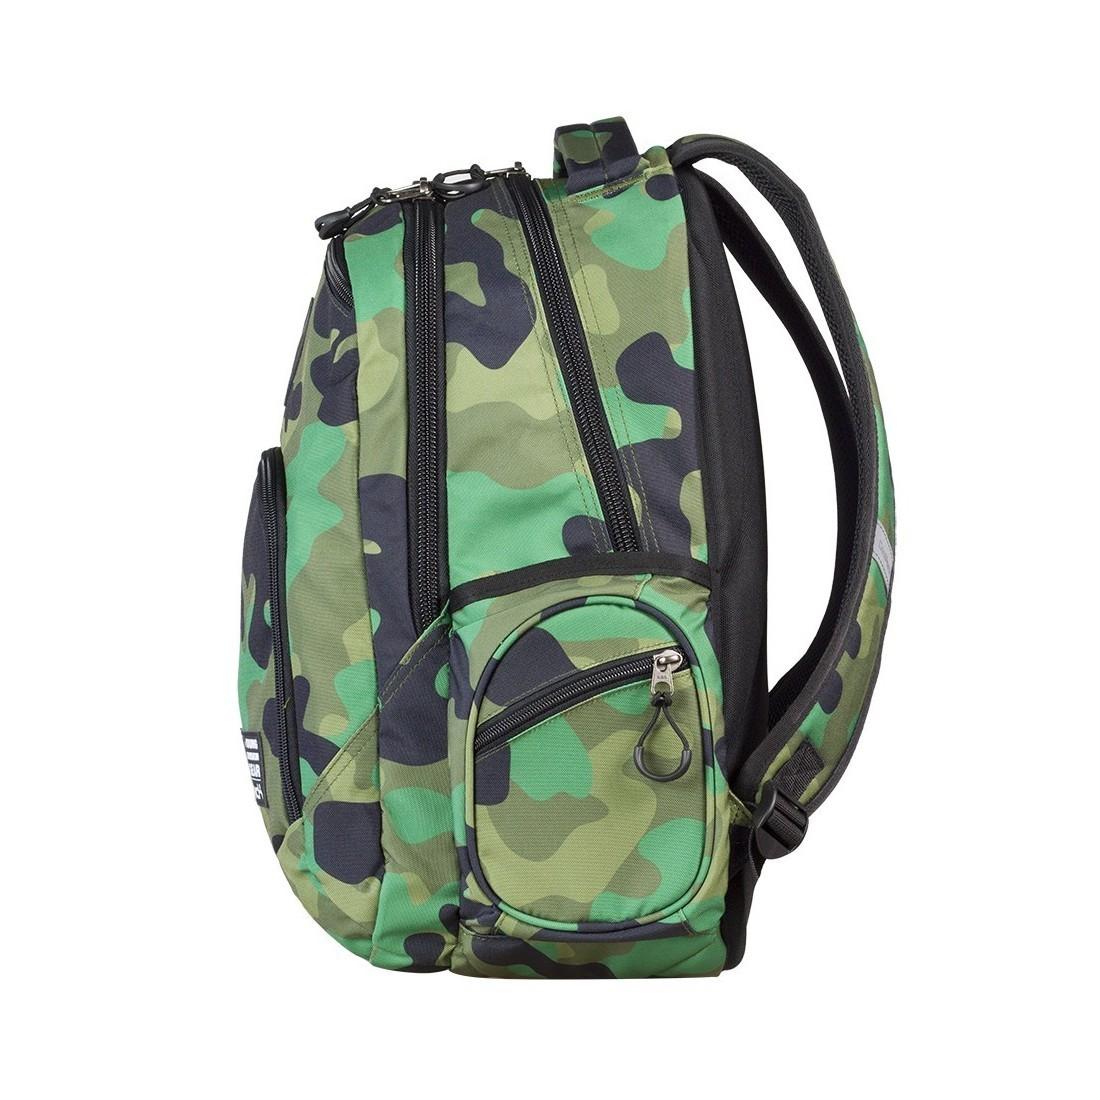 Plecak młodzieżowy COOLPACK BREAK MORO GREEN CP 599 - plecak-tornister.pl